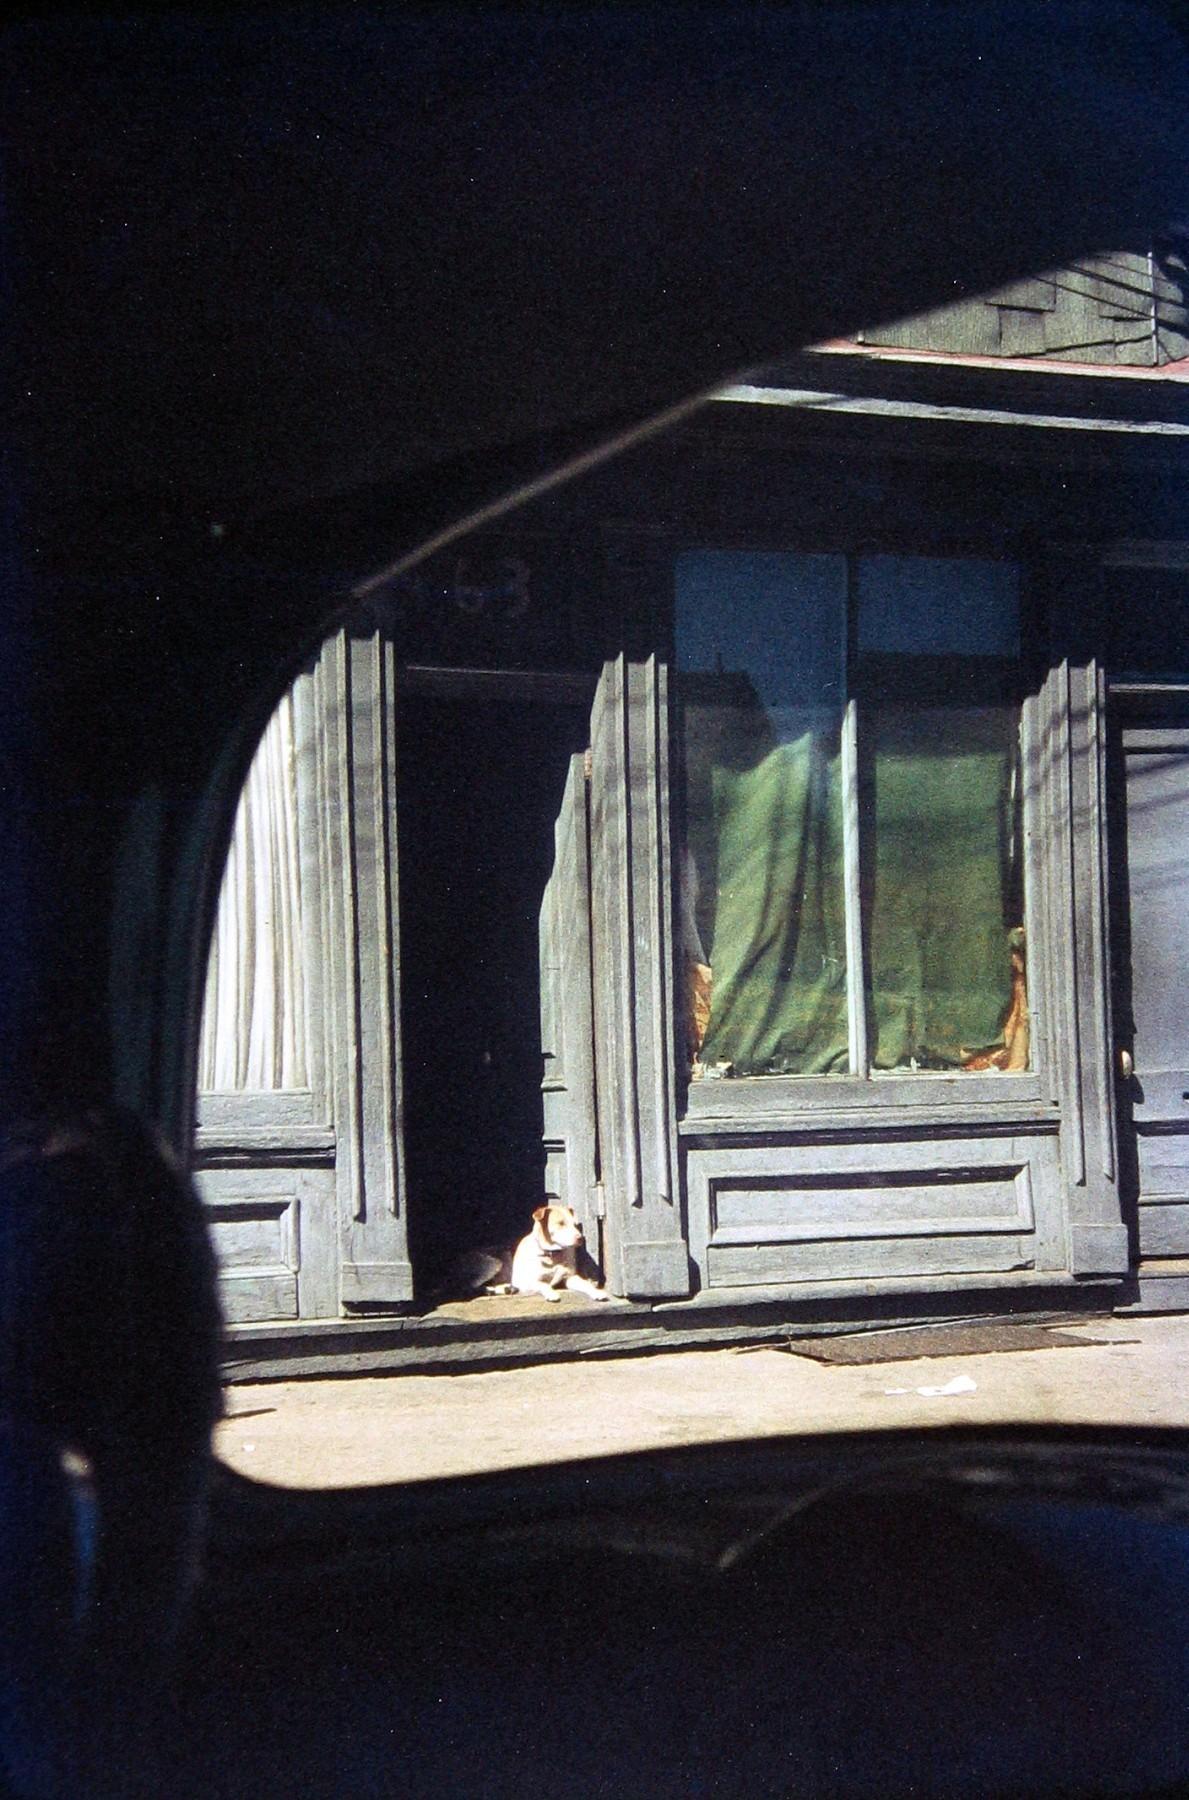 Собака в дверях, Патерсон, 1952. Фотограф Сол Лейтер